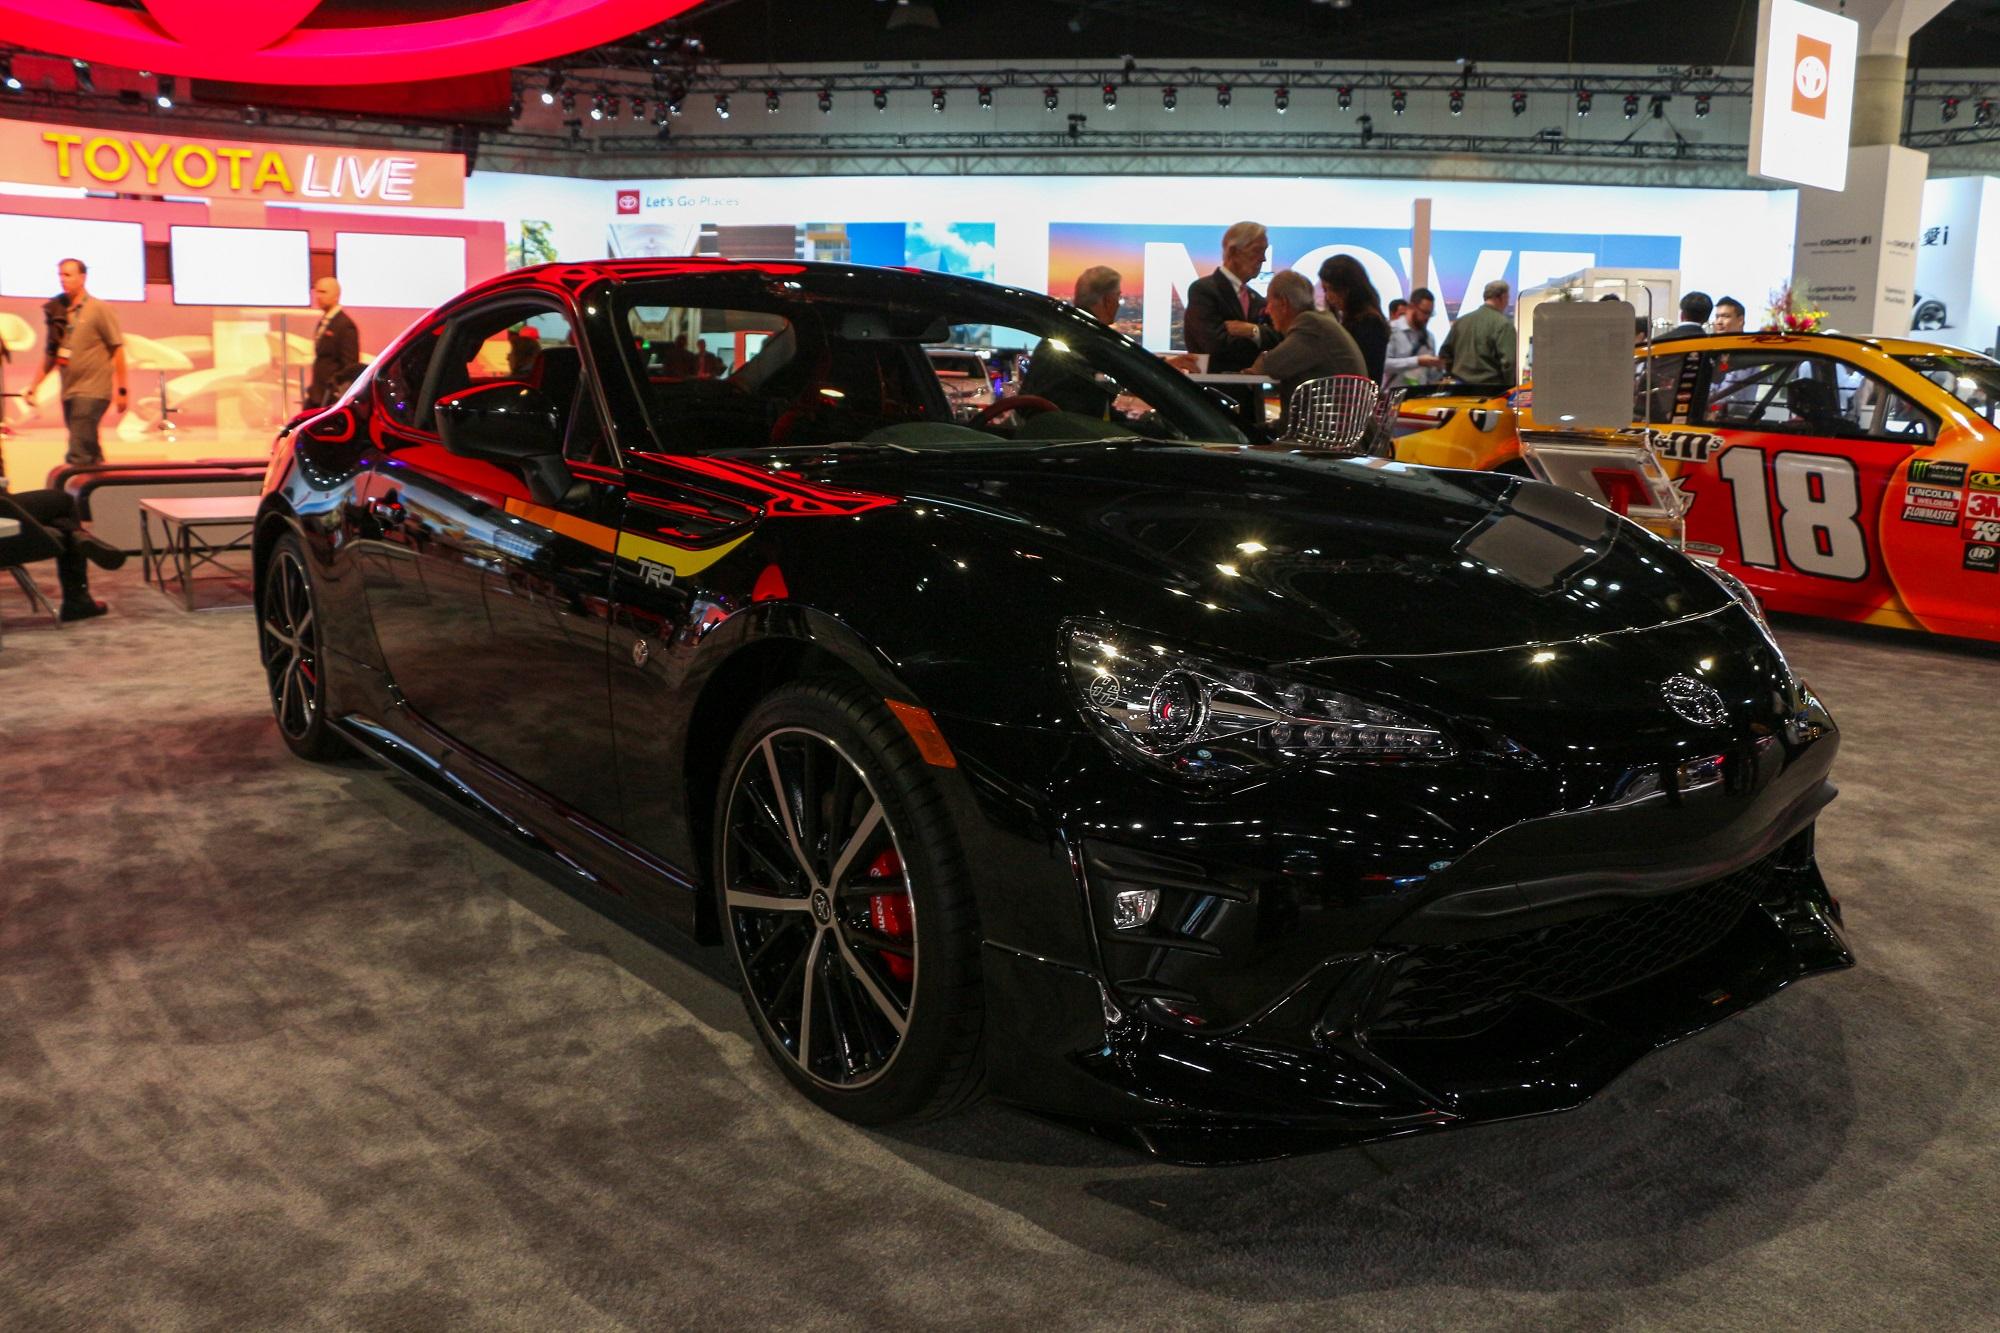 2019 Toyota 86 TRD Edition Los Angeles Auto Show